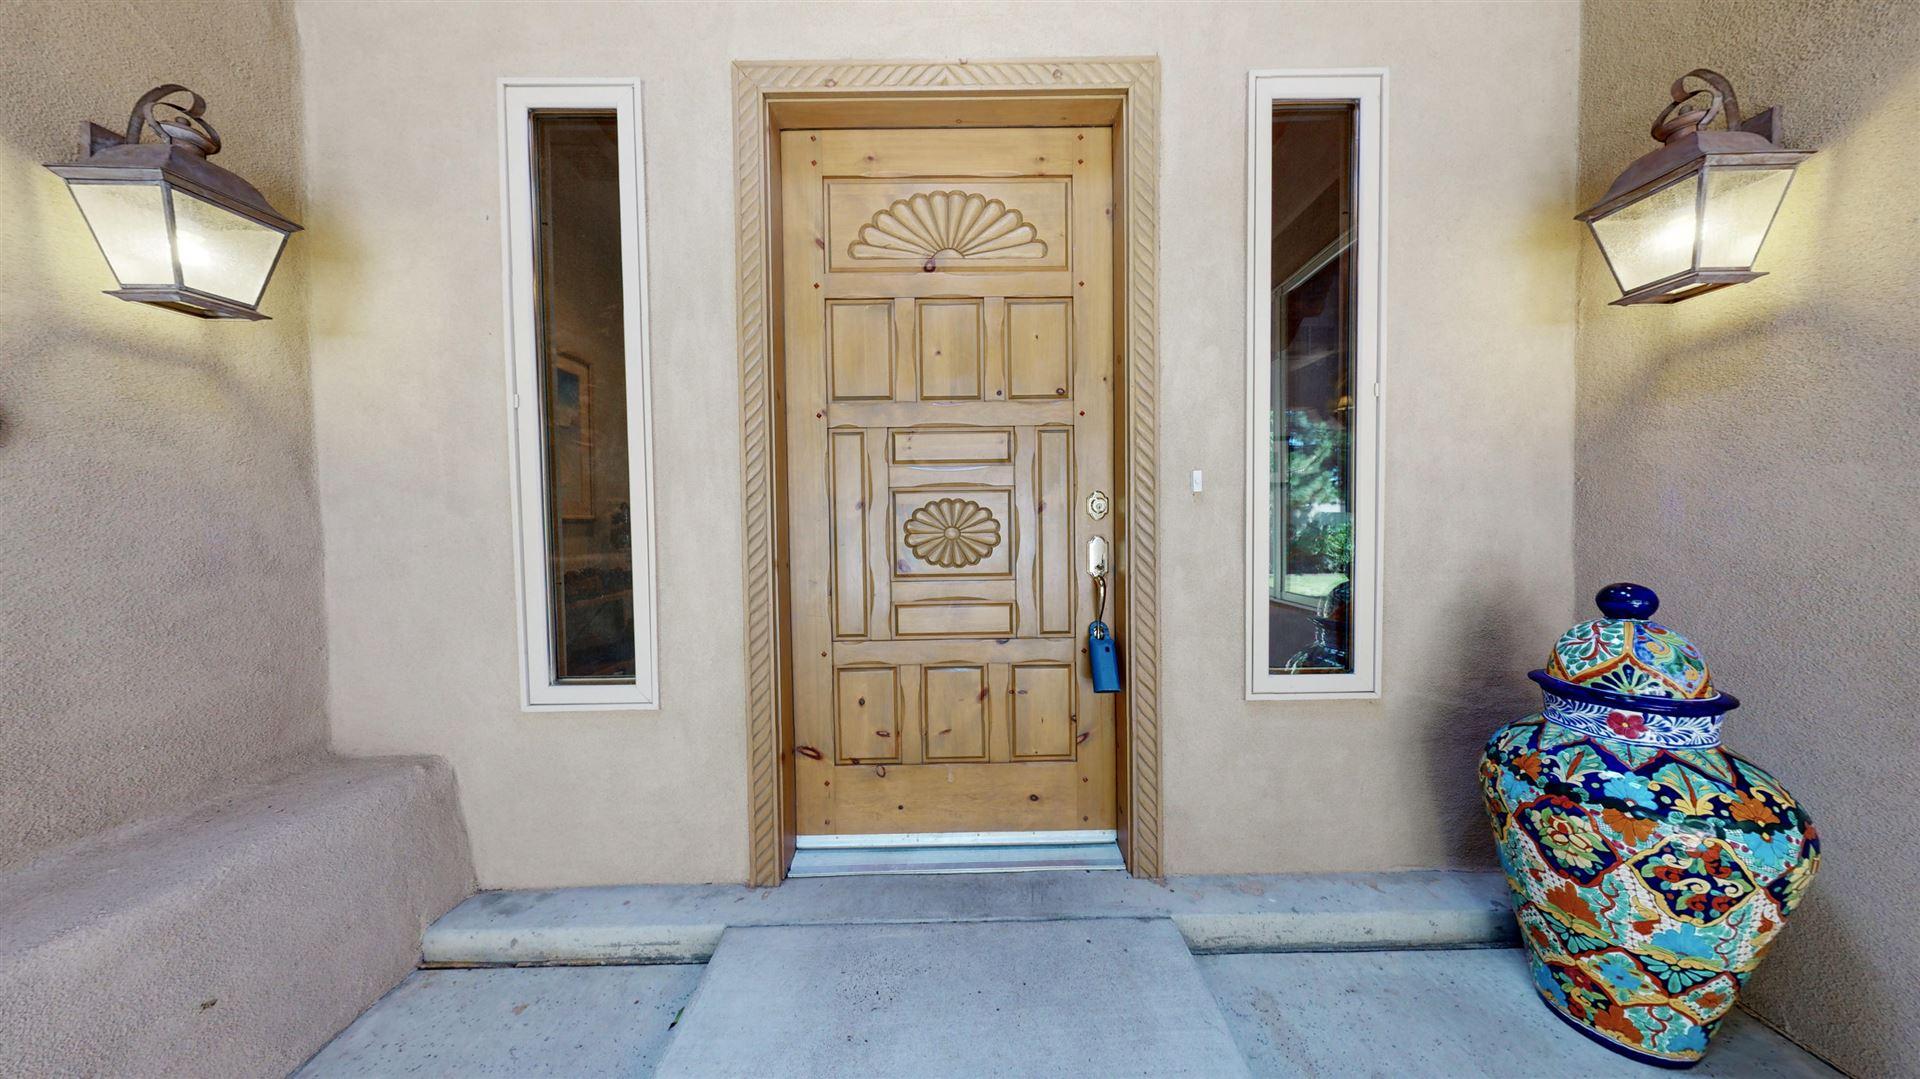 Photo of 1728 Rusty Road NW, Albuquerque, NM 87114 (MLS # 968953)